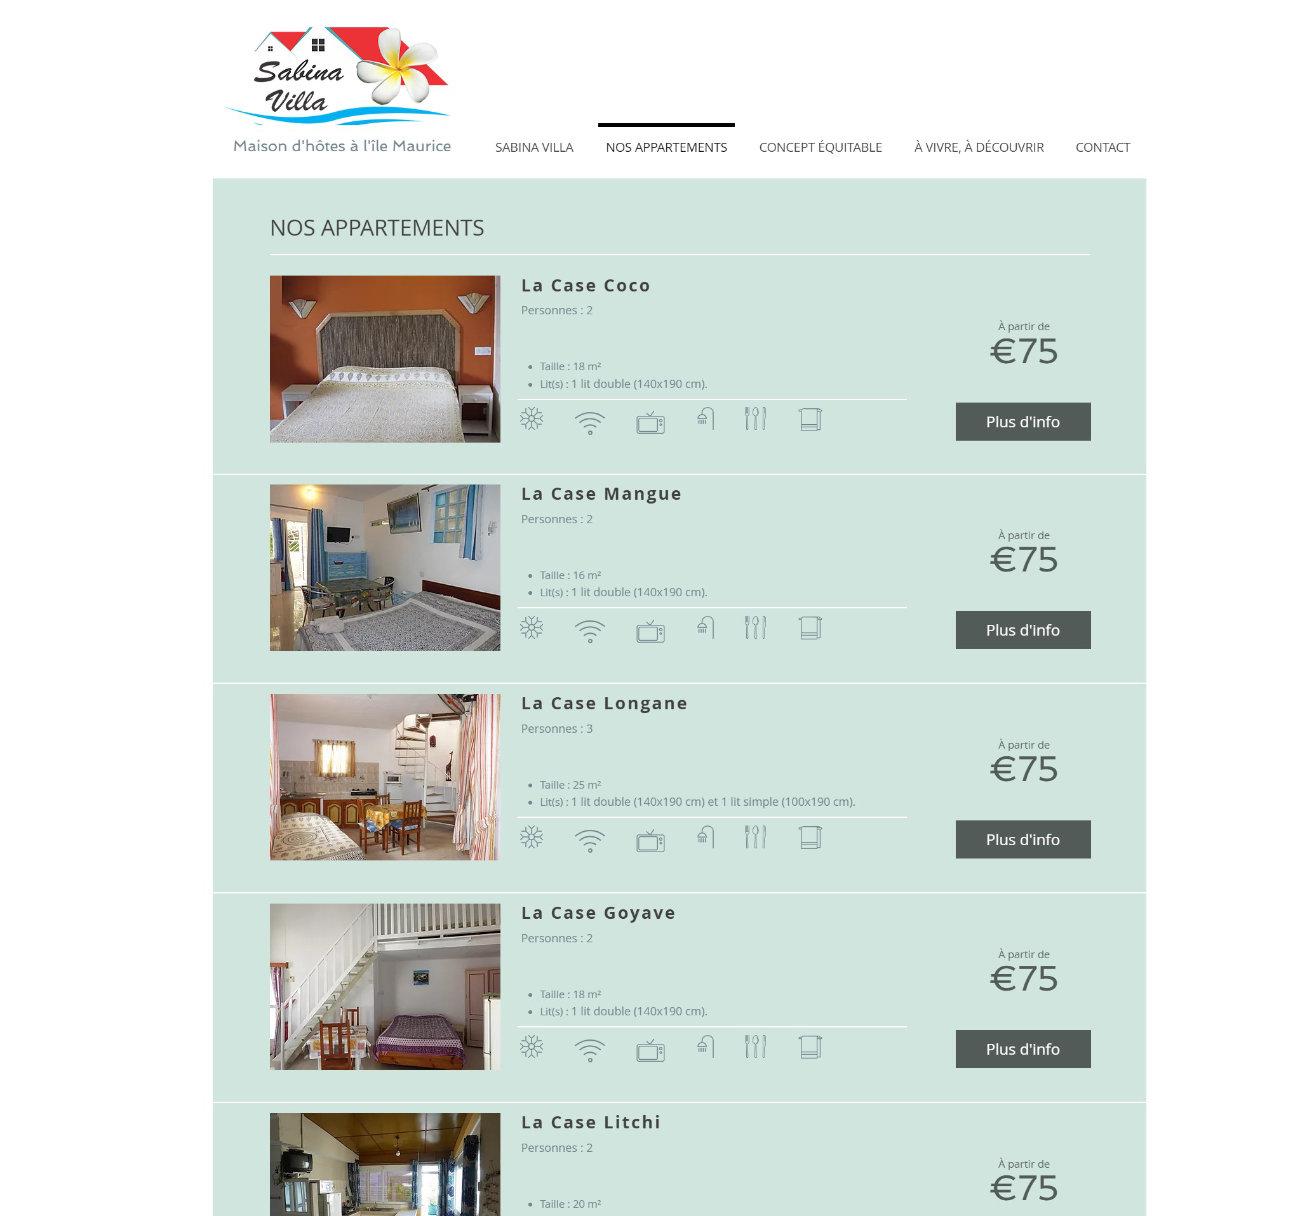 Aperçu de la pageappartement du site web sabina villa